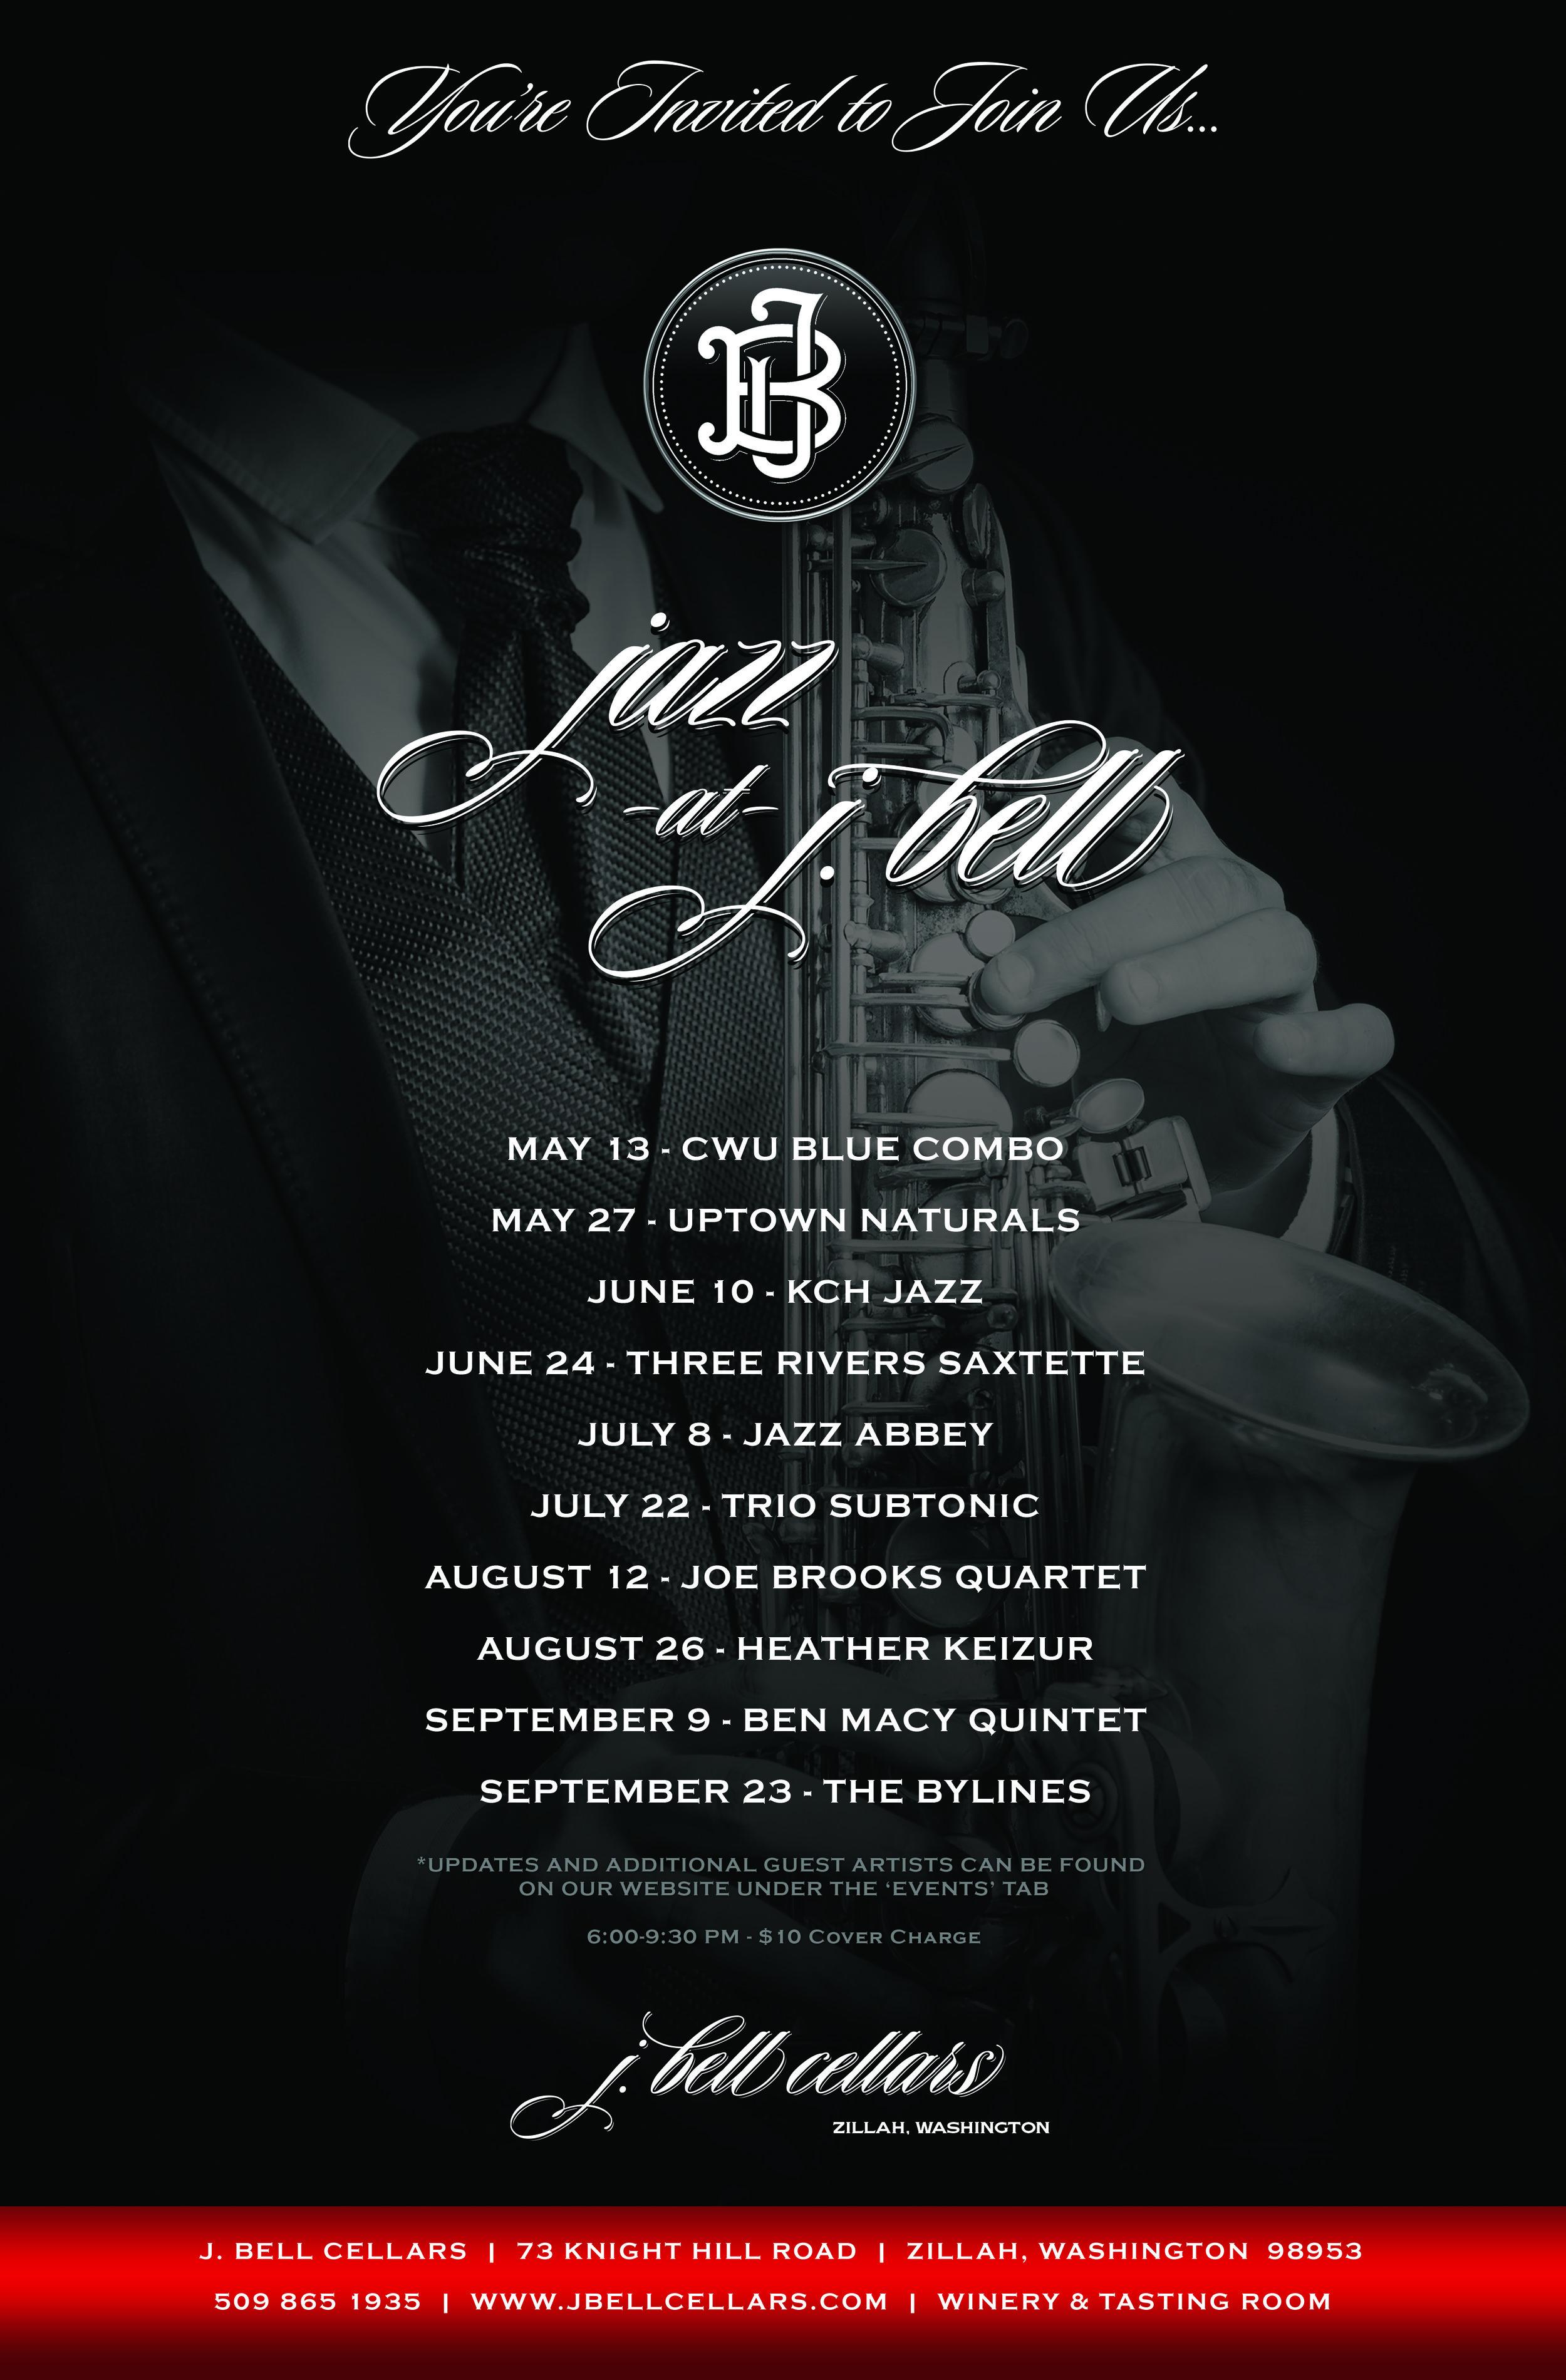 Jazz at J Bell 2017 [v50] by Graham Hnedak Brand G Creative 24 MAR 2017 rev 12 May 2017.jpg